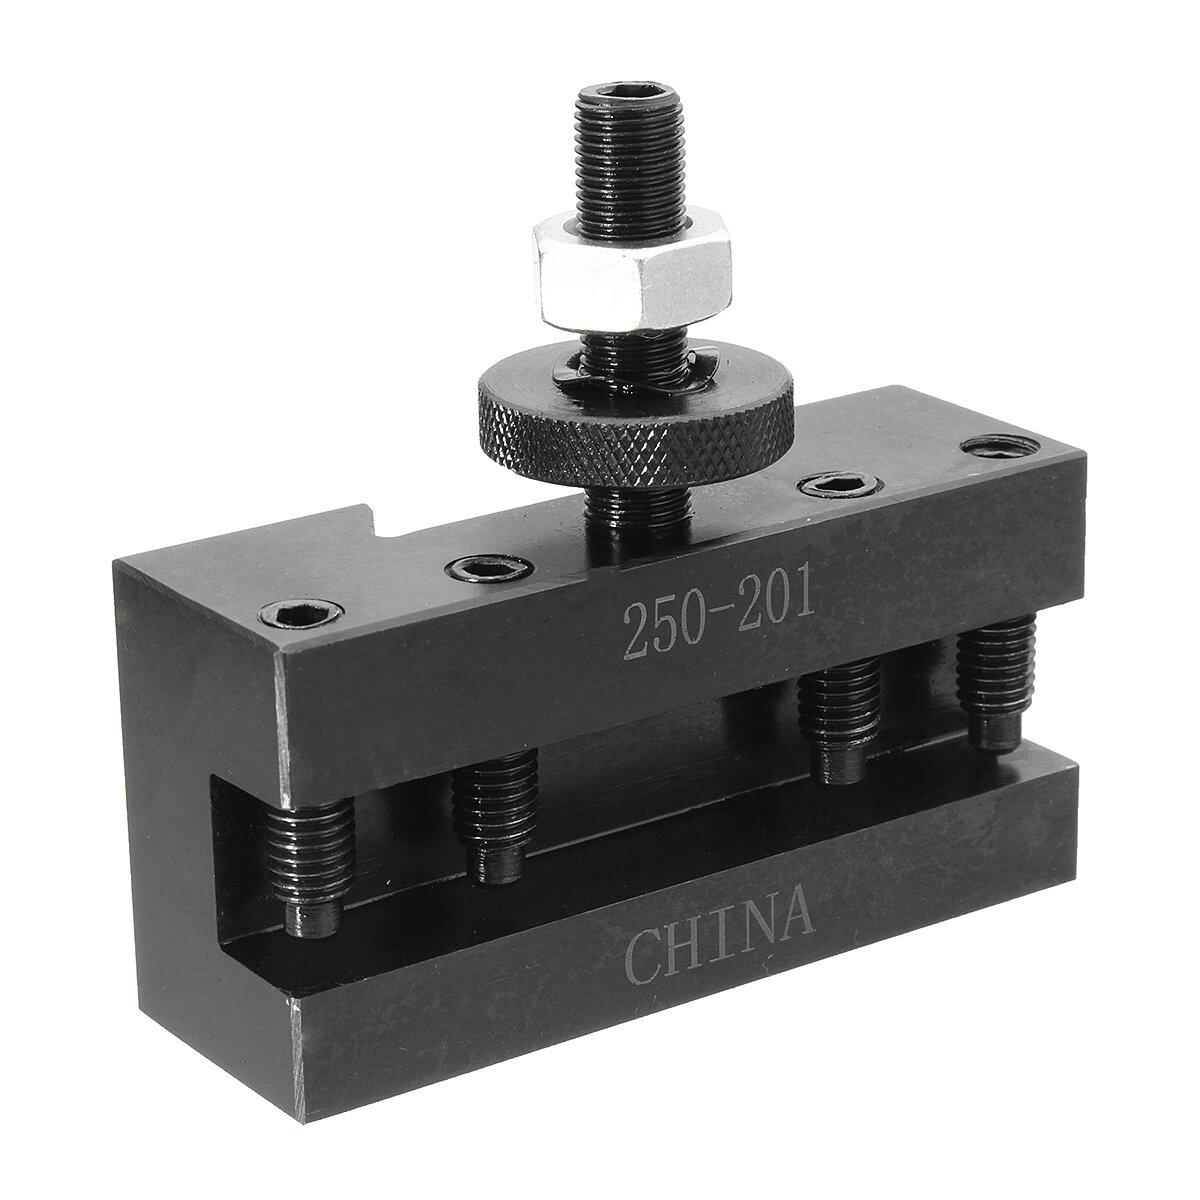 Quick Change Lathe Tool Bit Bits Post Holder For Turning /& Facing CNC Machine